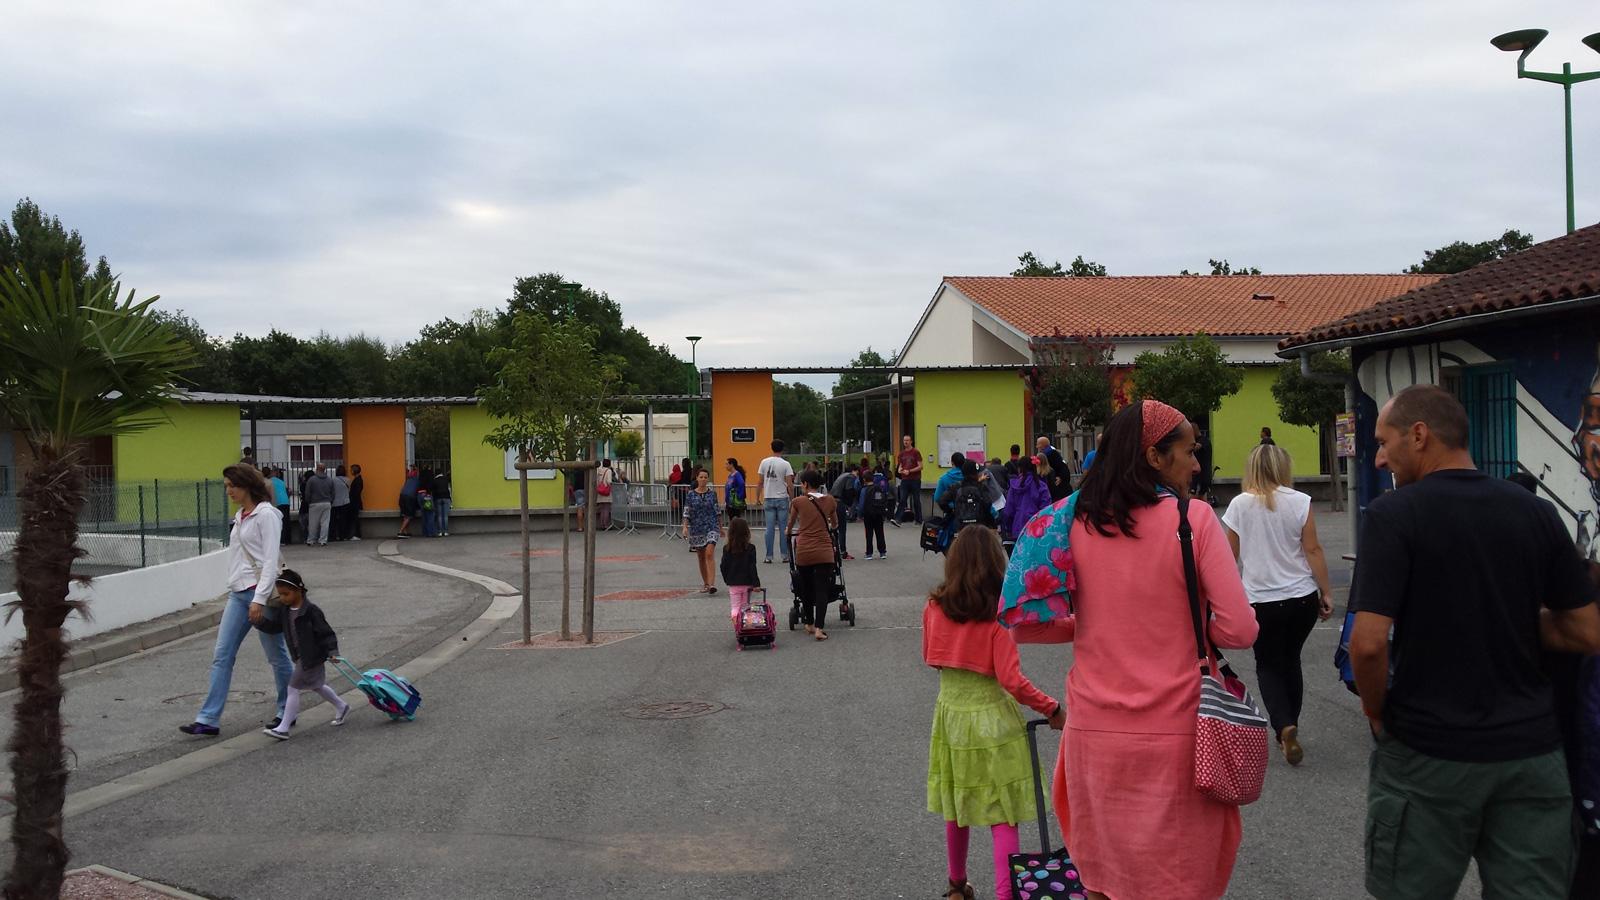 mairie-eaunes-rentree-scolaire